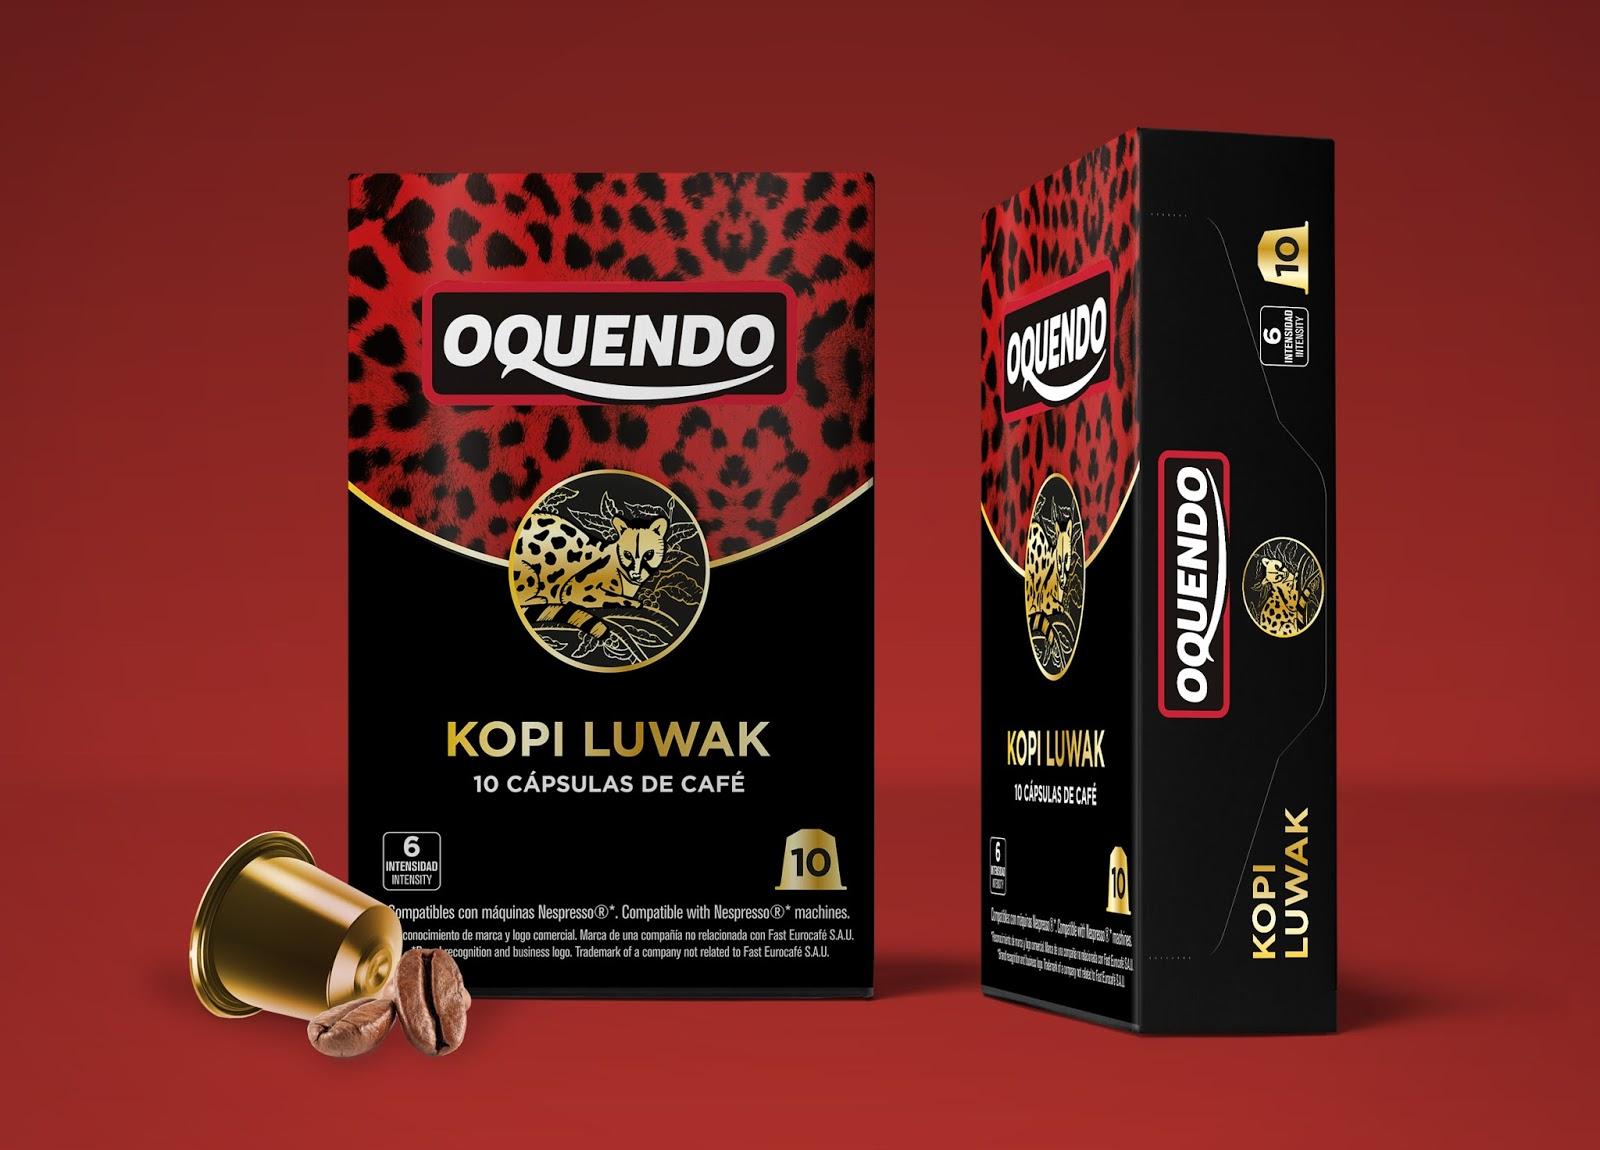 Surya Mas Jaya Kopi Luwak Packaging Lembah Cimanong 250 Gram By Contents Coffee Capsules Substrate Materials Cardboard Printing Process Foil Stamping Gloss Ink